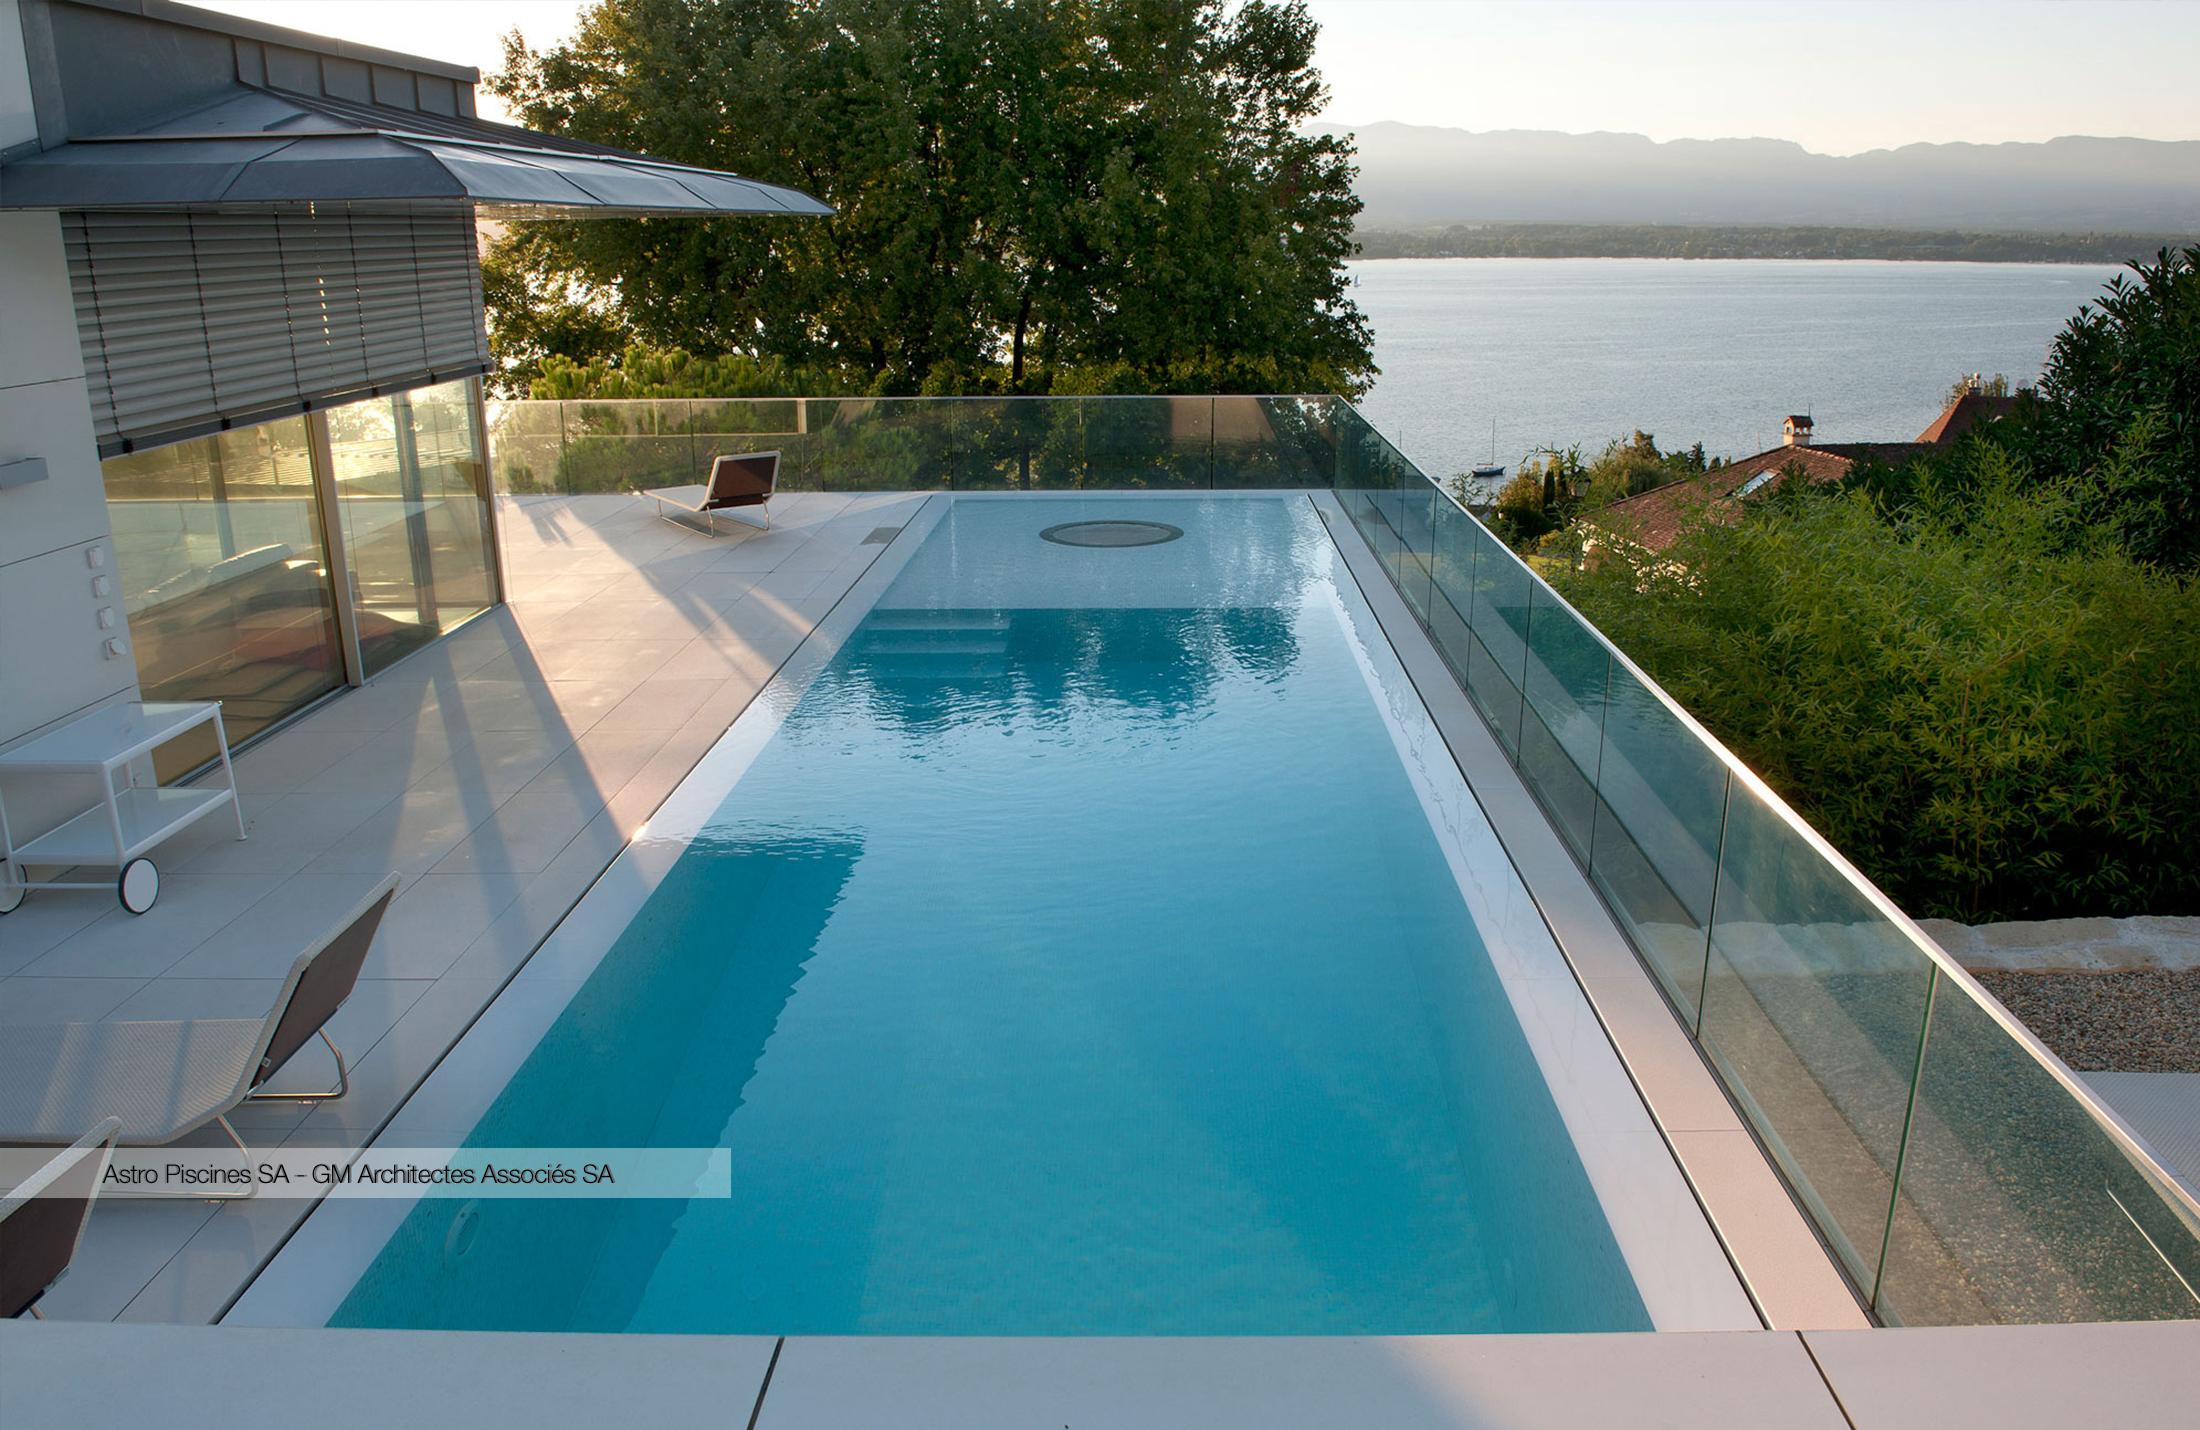 pourquoi r nover sa piscine astro piscines 1974. Black Bedroom Furniture Sets. Home Design Ideas